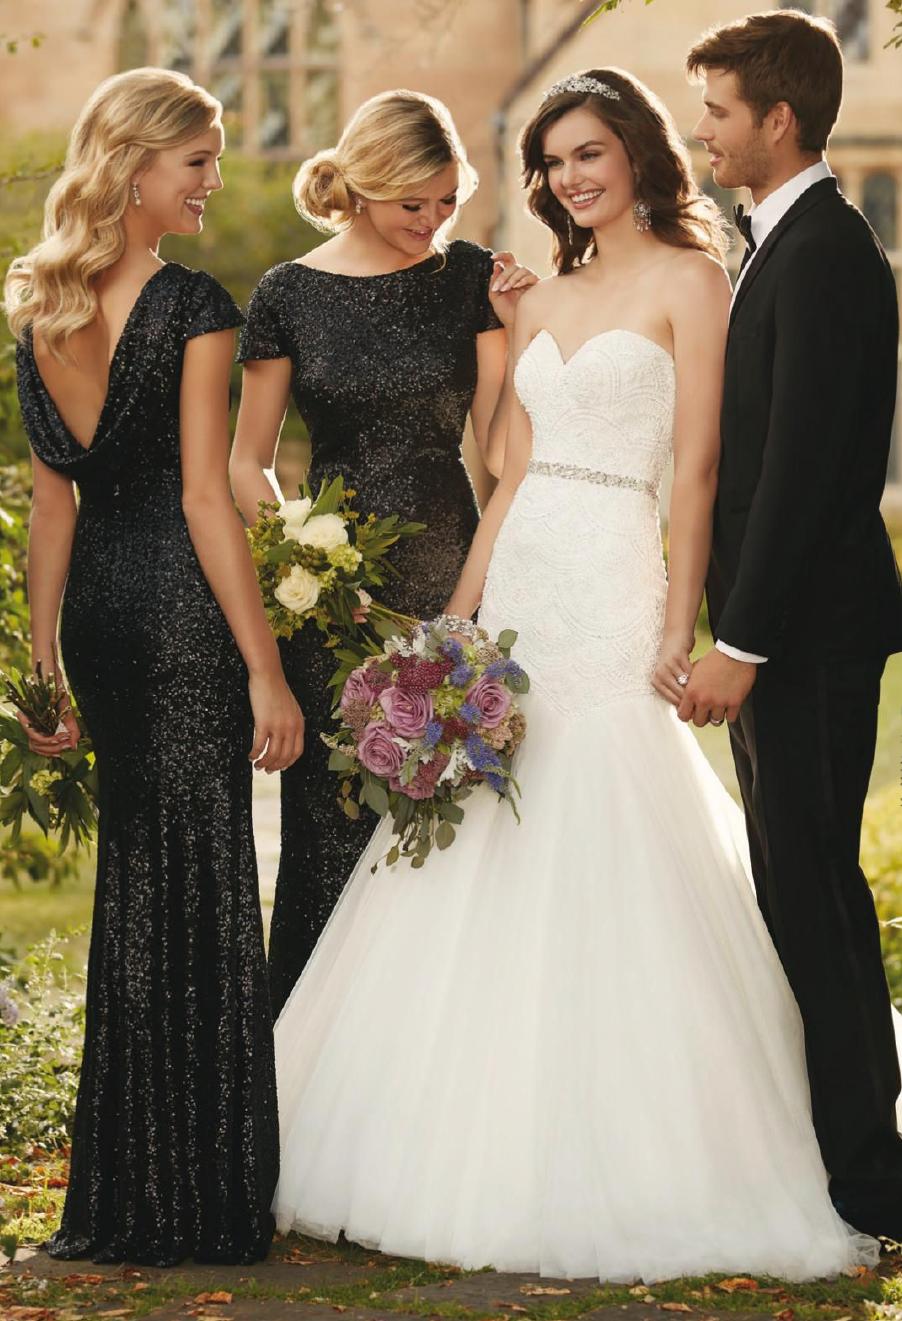 Elegant Black Bridesmaid Dresses Black bridesmaid